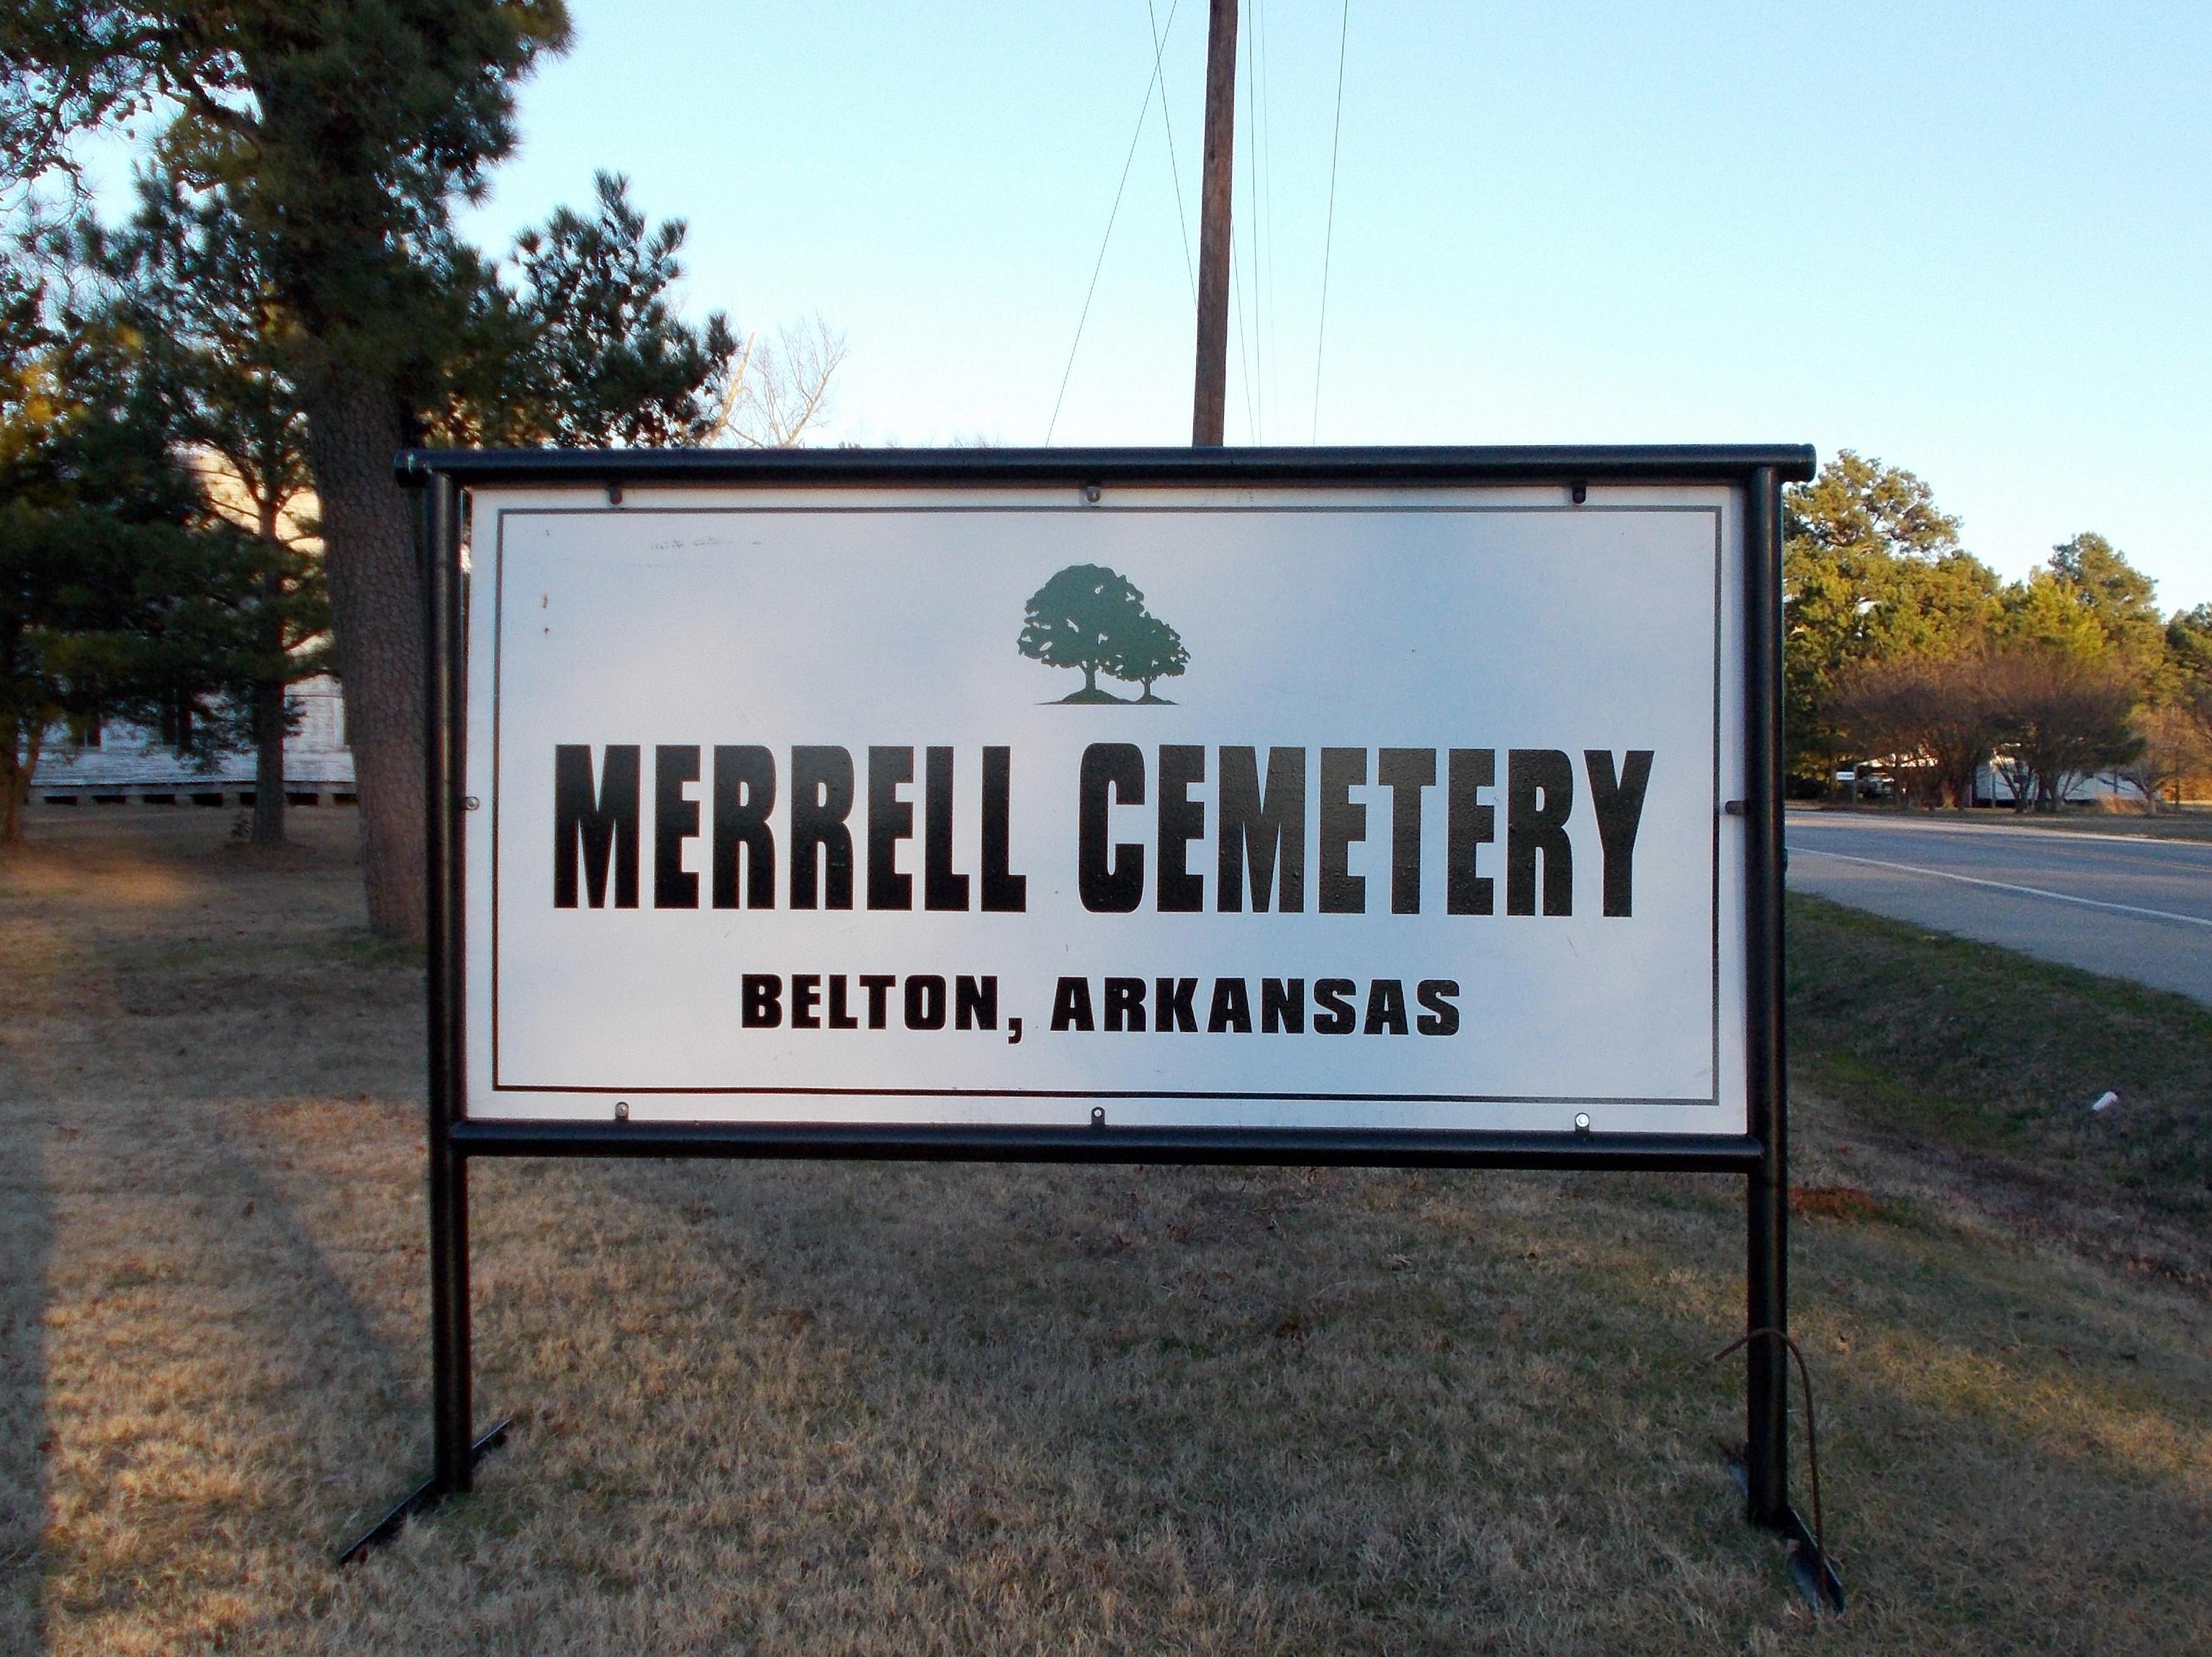 Merrell Cemetery